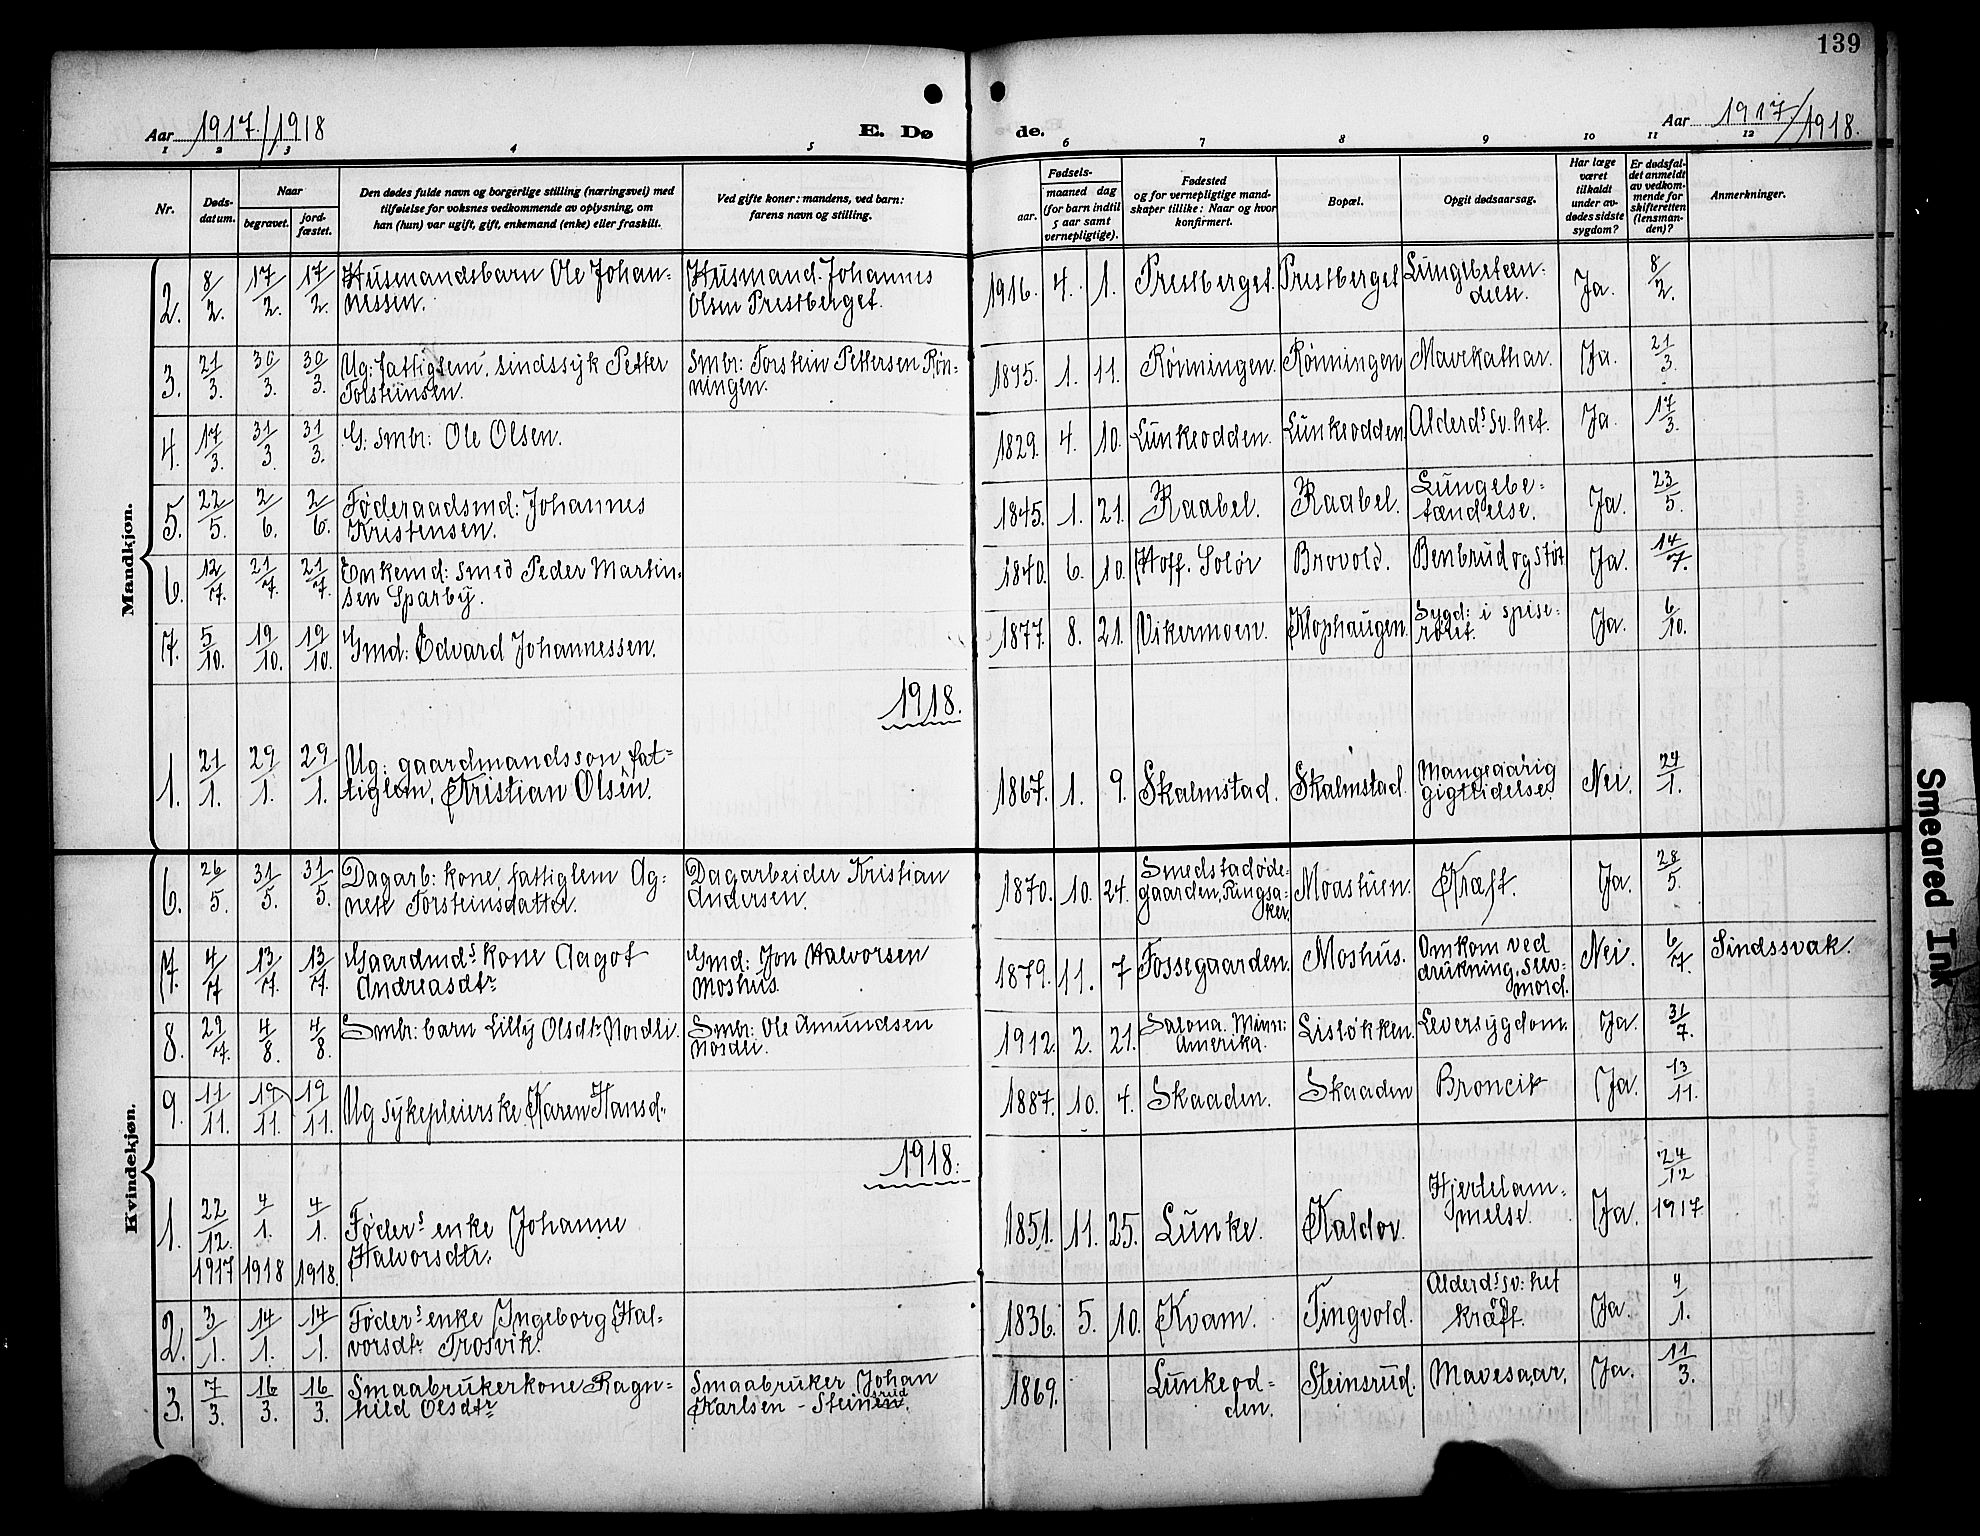 SAH, Øyer prestekontor, Klokkerbok nr. 7, 1913-1928, s. 139